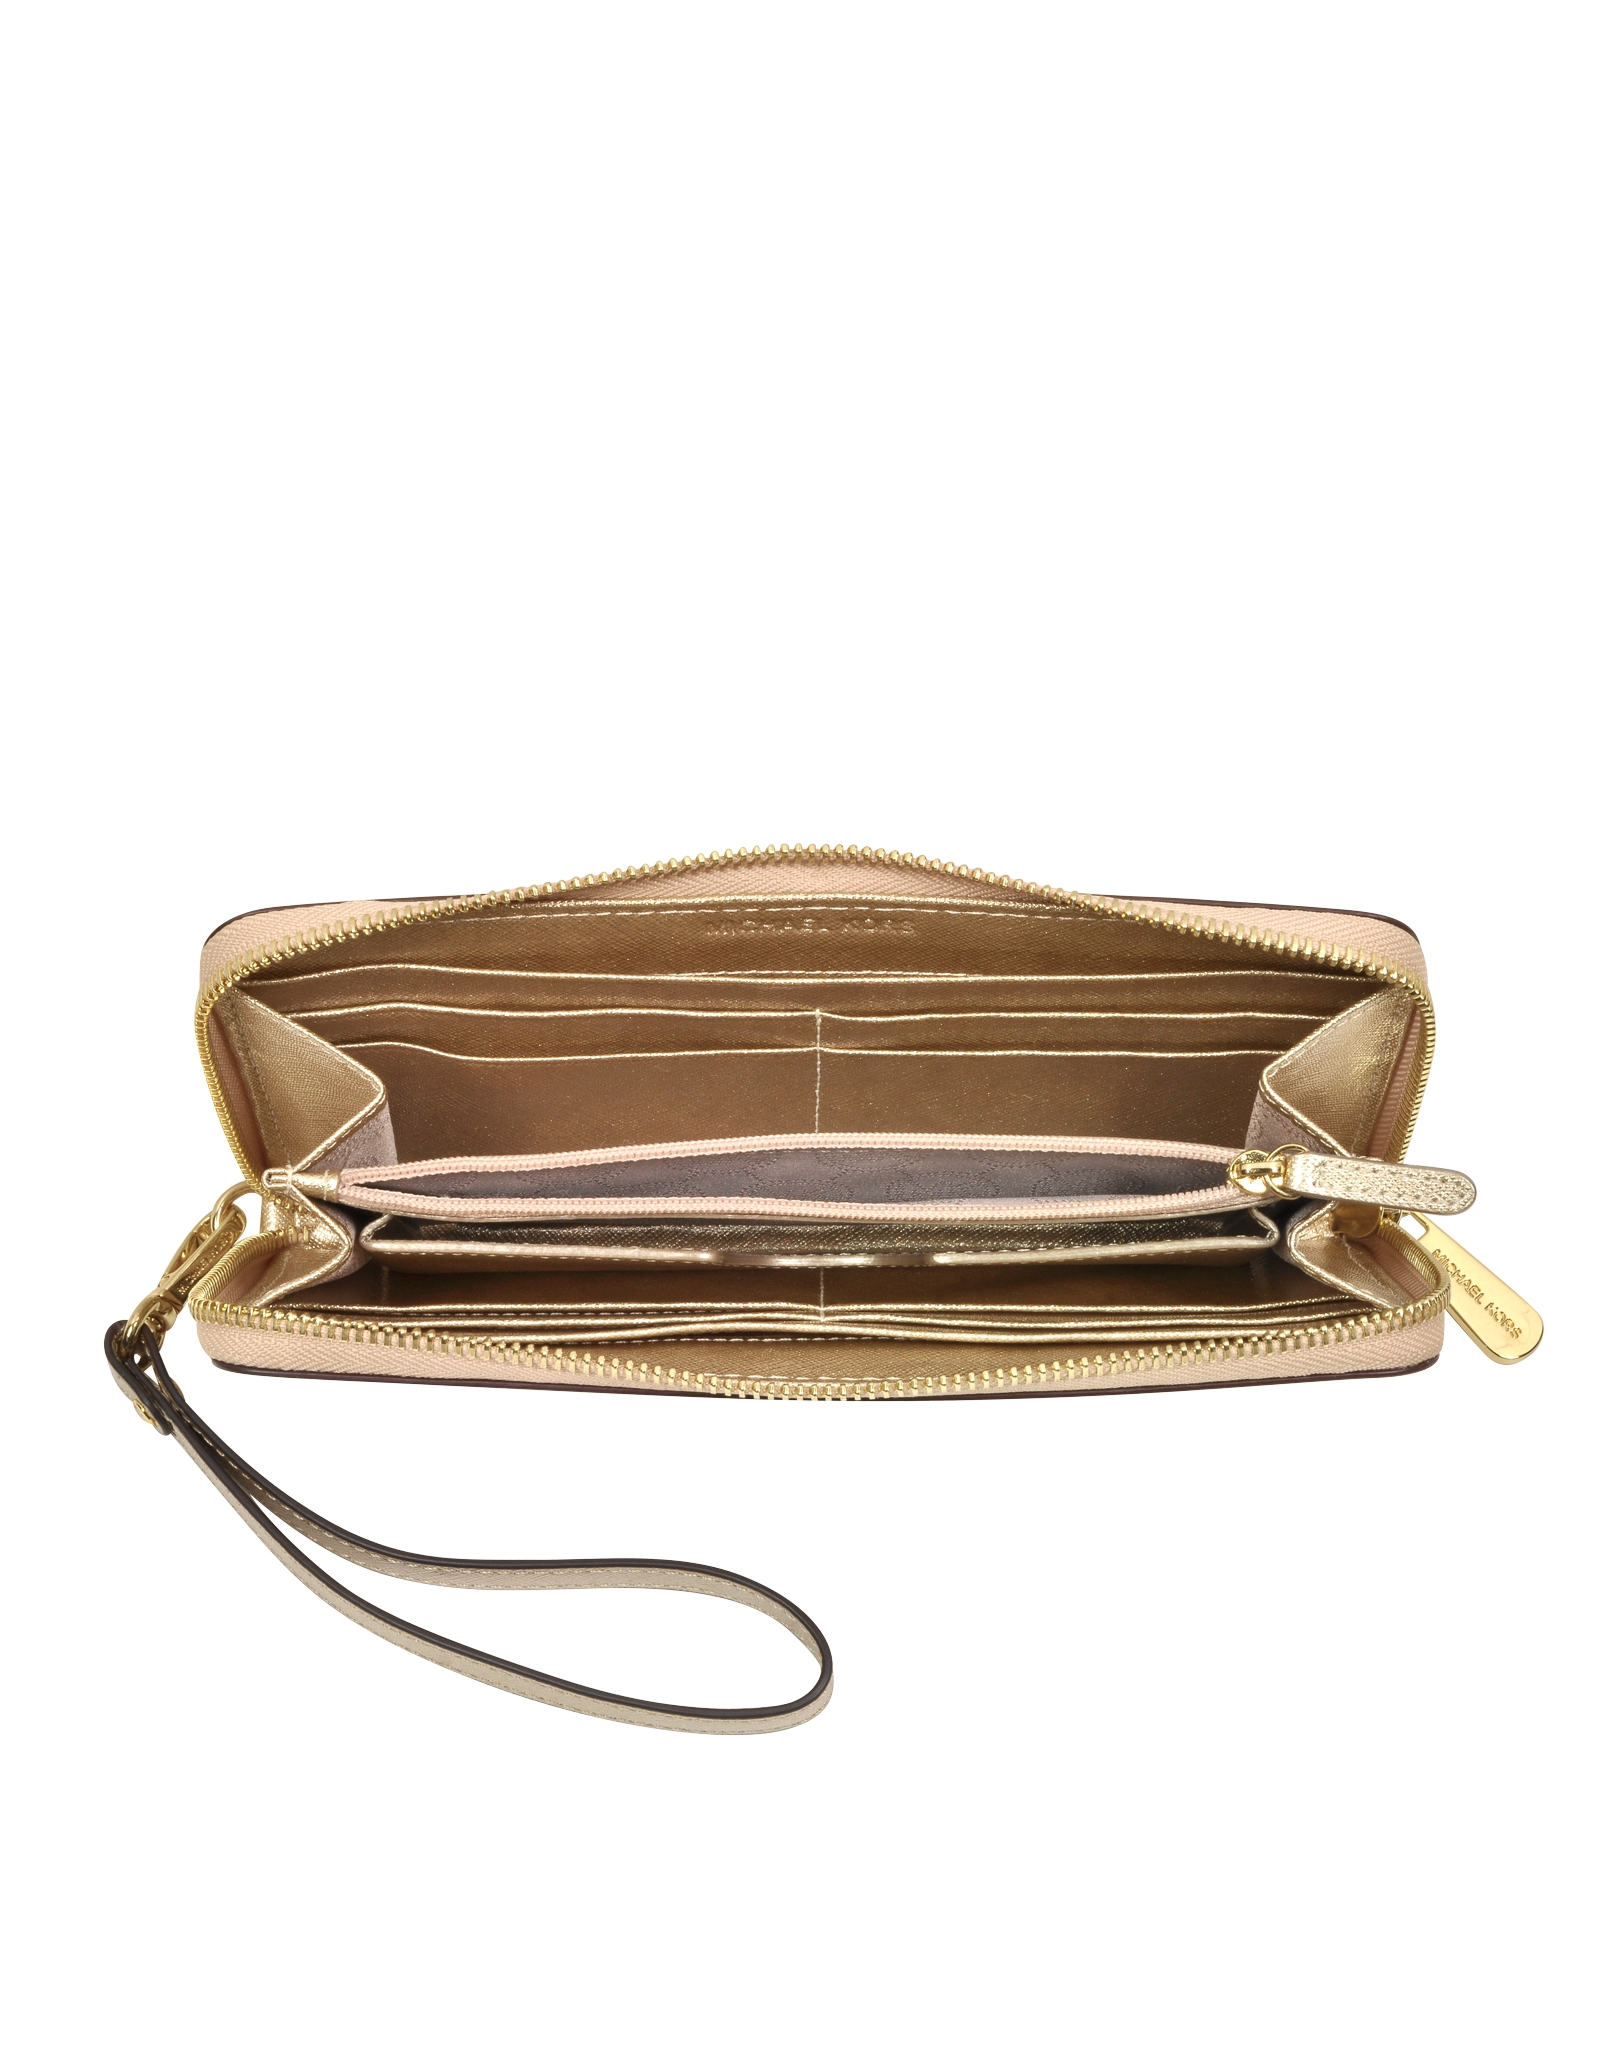 1dc0bab5a5613c Michael Kors Jet Set Travel Pale Gold Metallic Saffiano Leather ...